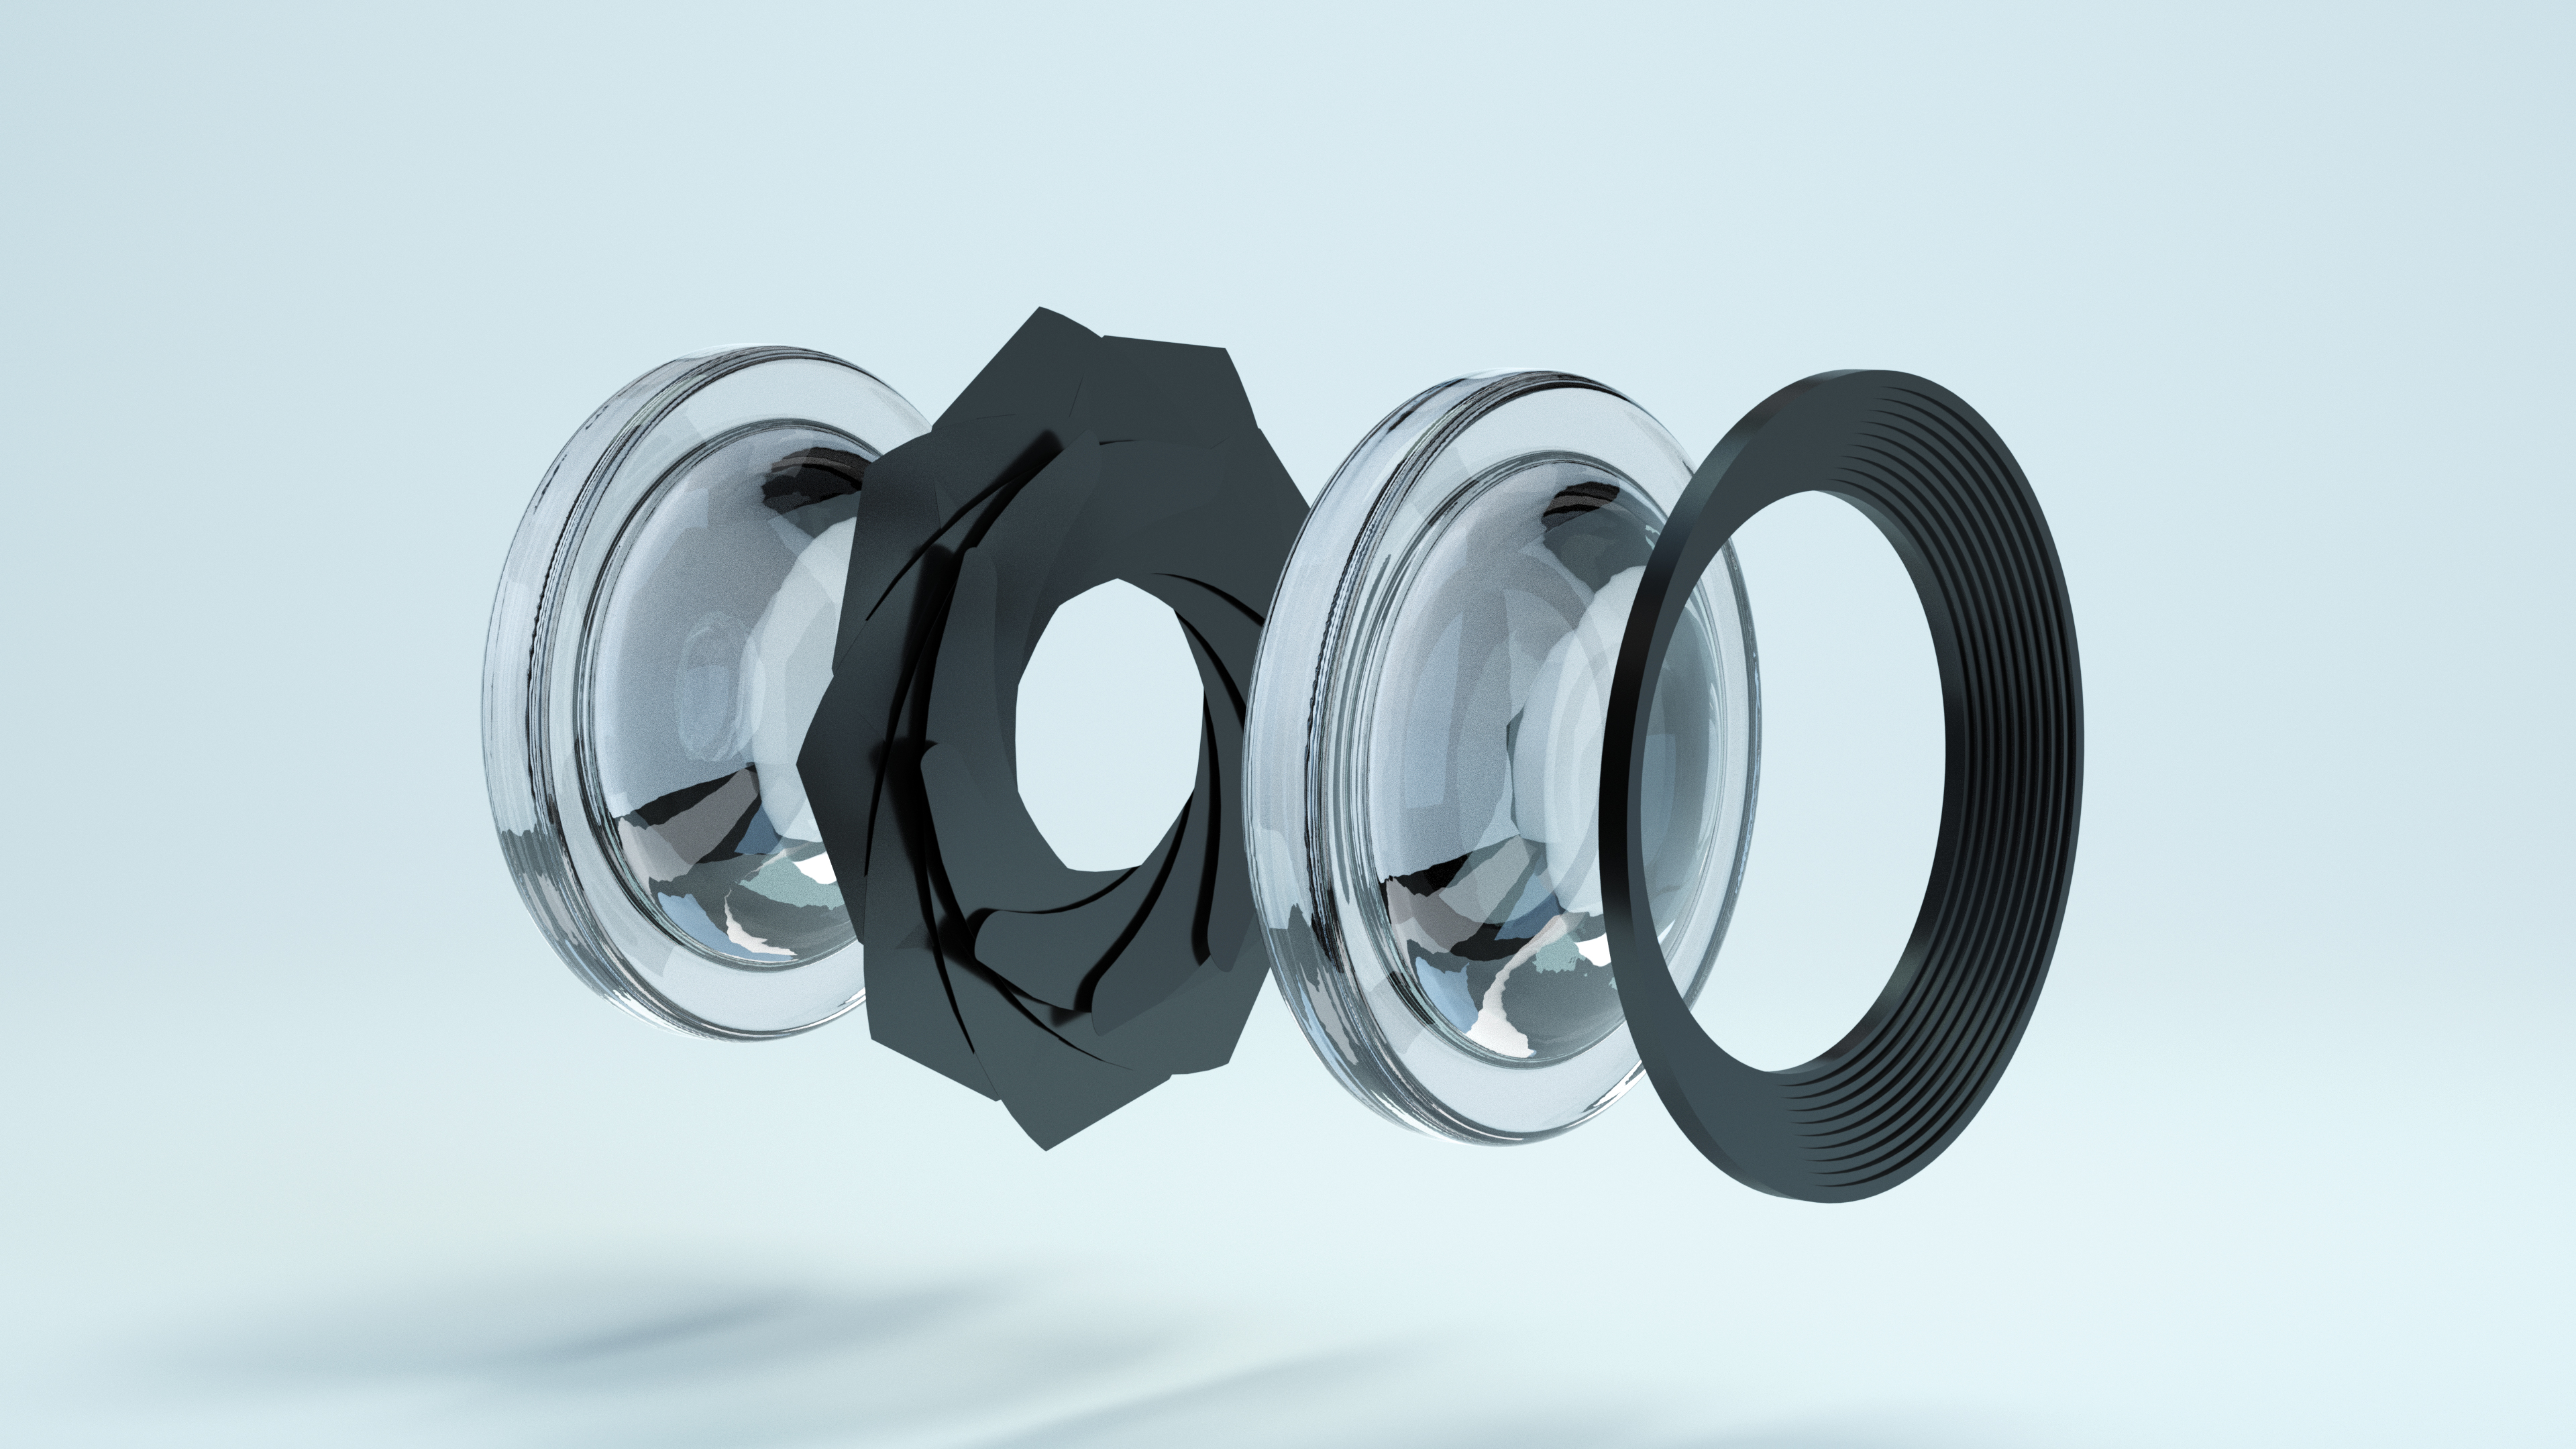 A beginner's guide to camera aperture